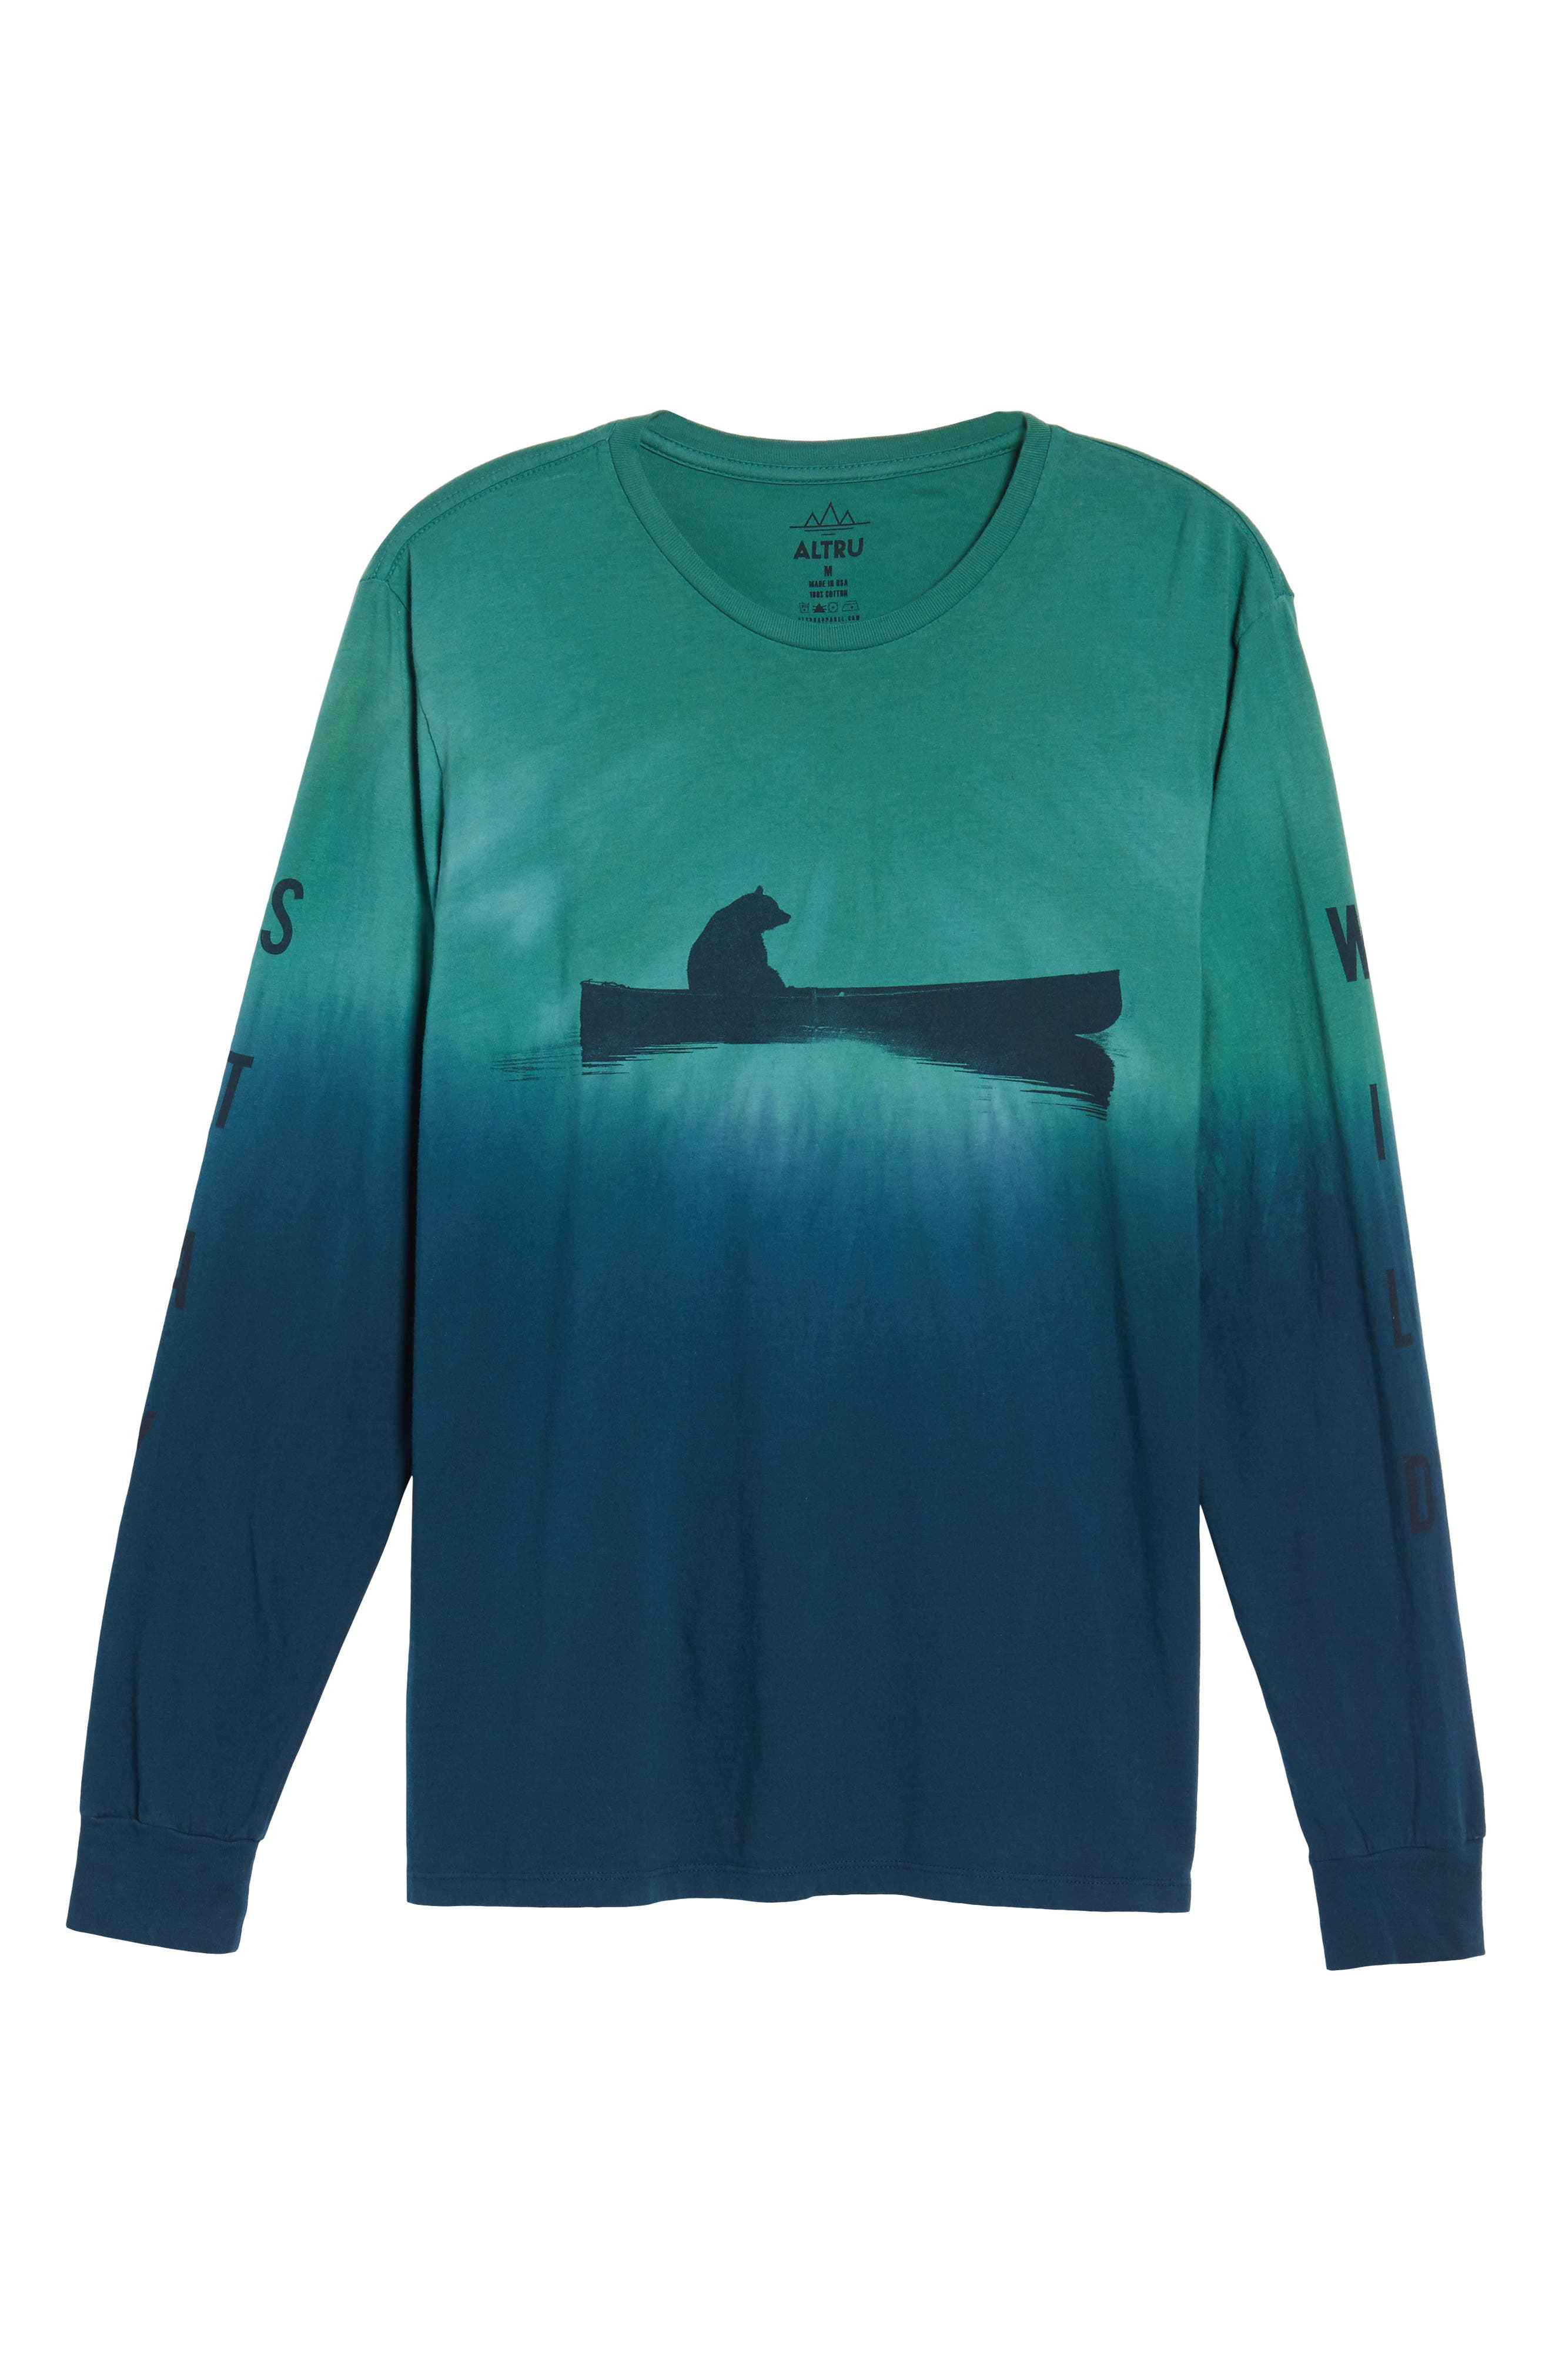 Up a Creek T-Shirt,                             Alternate thumbnail 6, color,                             ALGAE/ NAVY